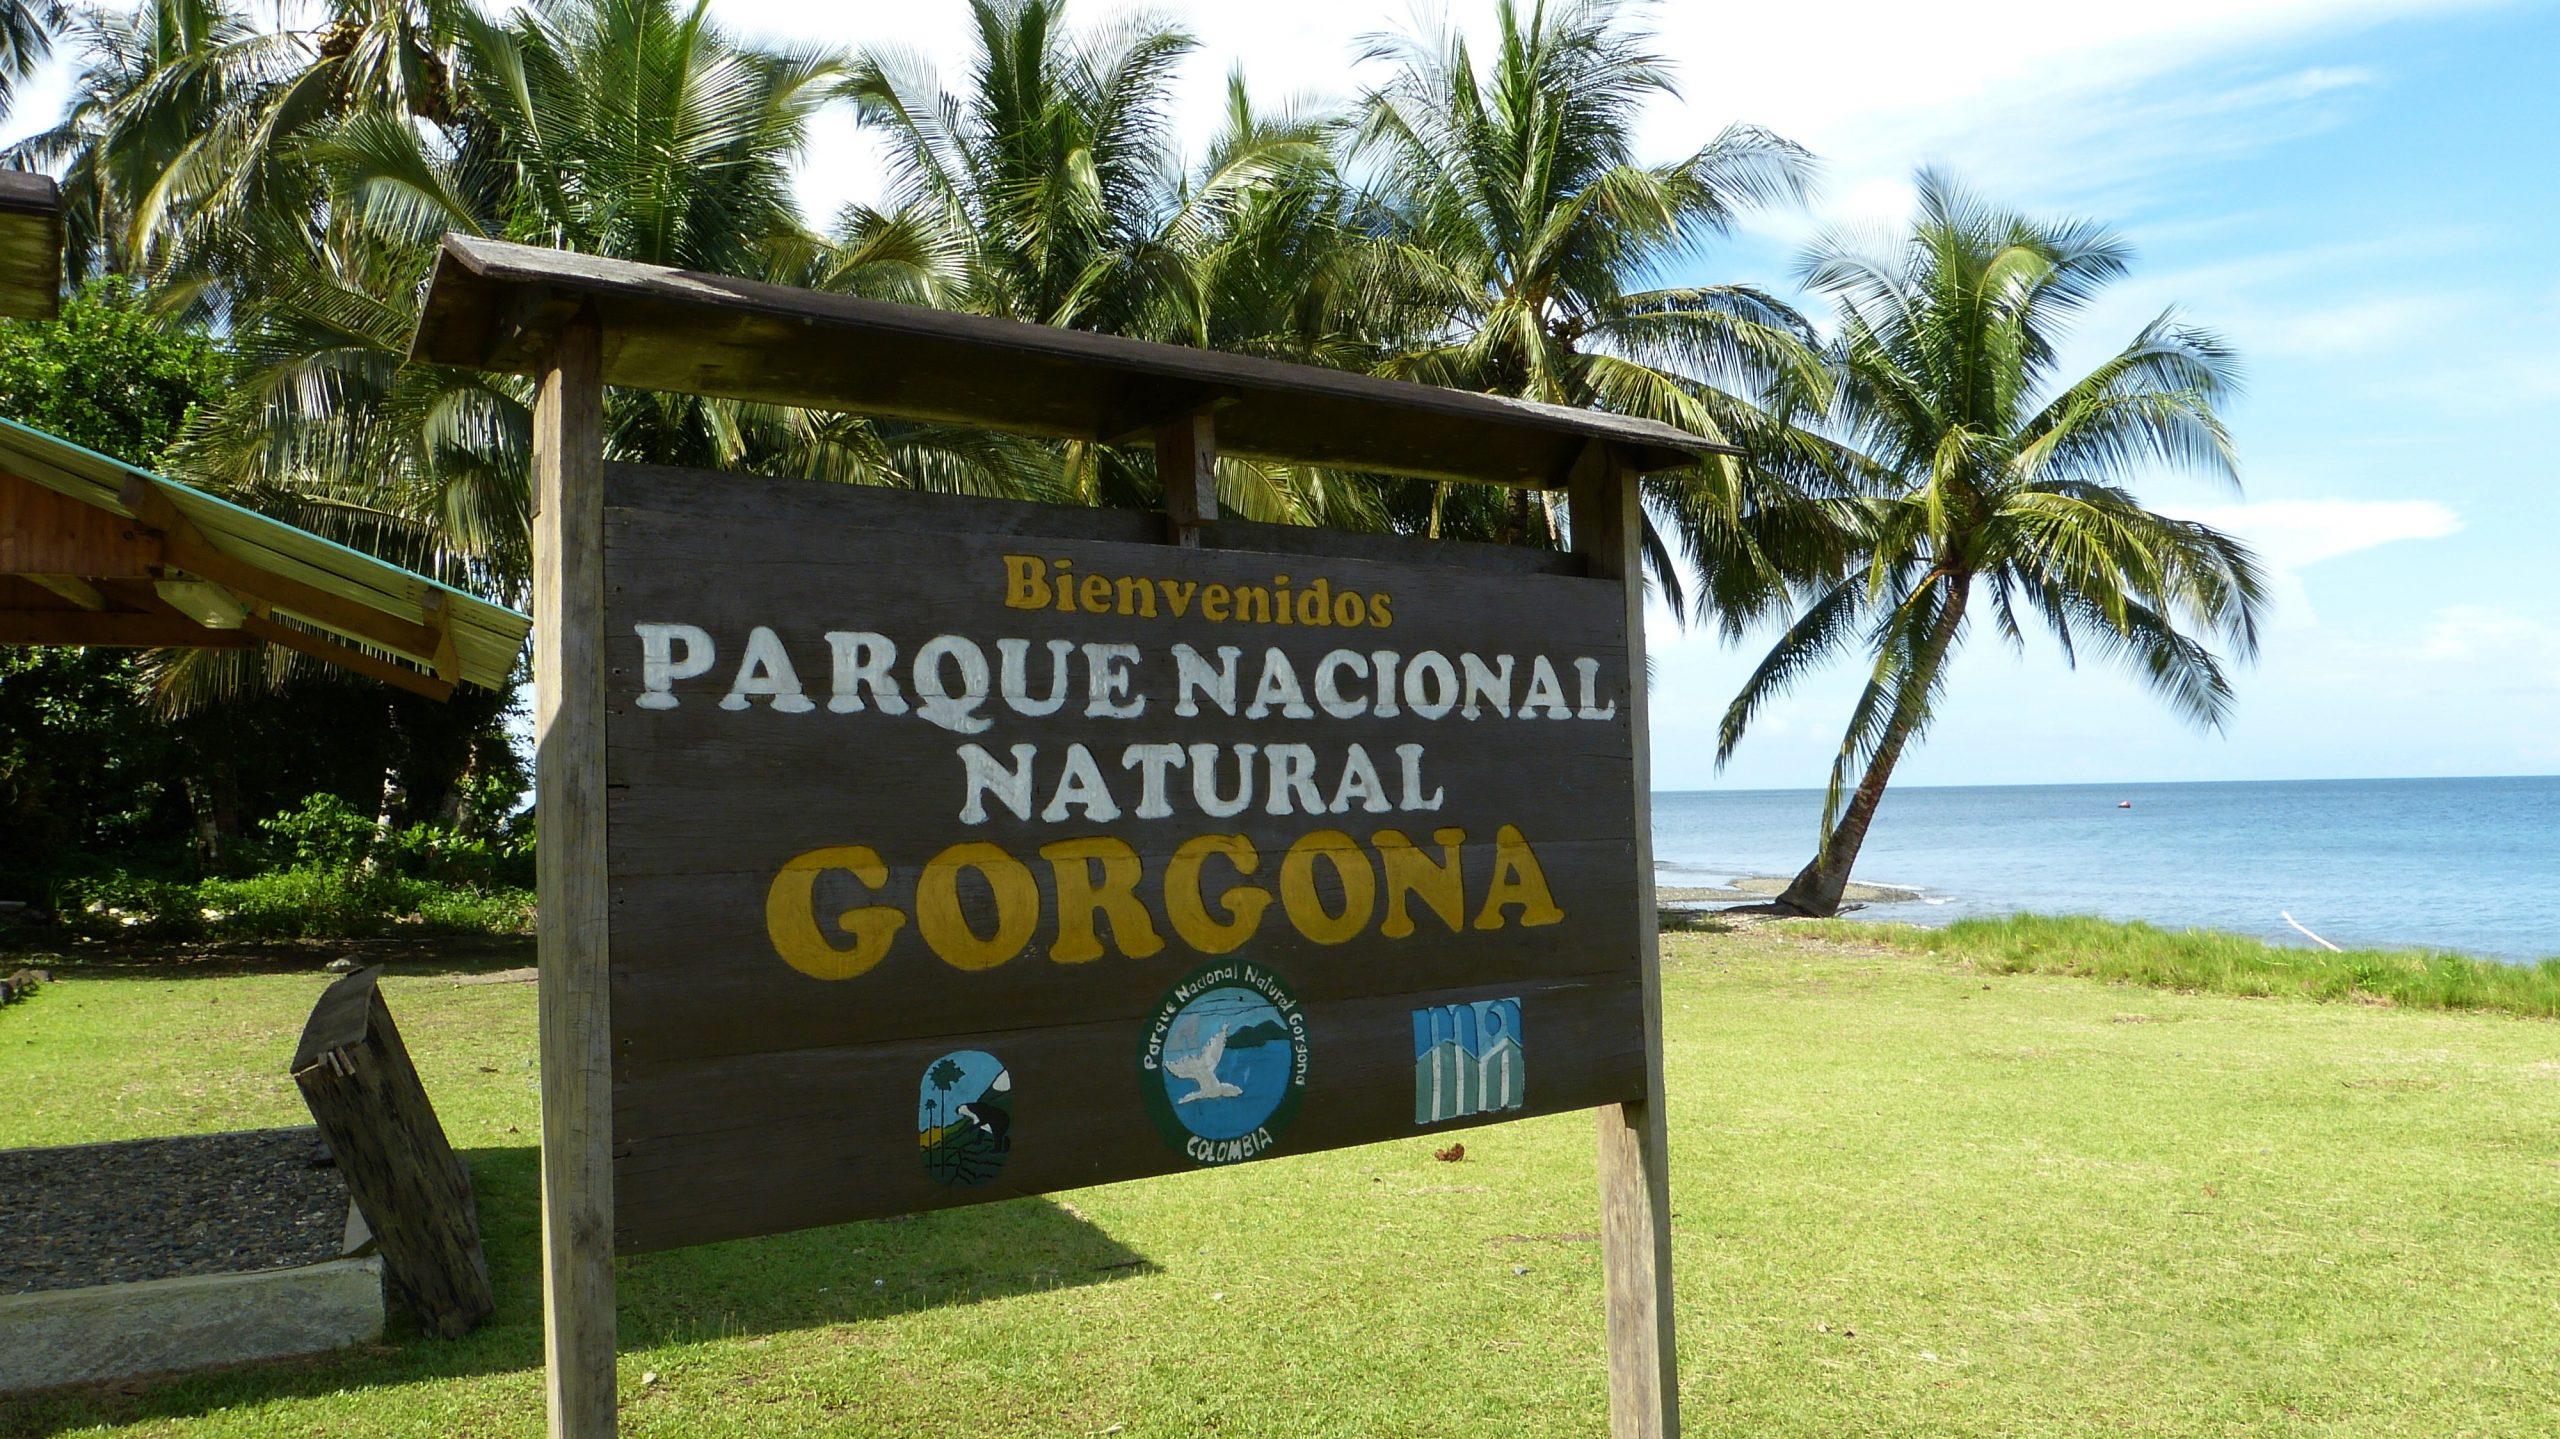 El Parque Nacional Natural Gorgona implementa sistema de paneles solares - FOTO-PEDRO-ACEVEDO-scaled